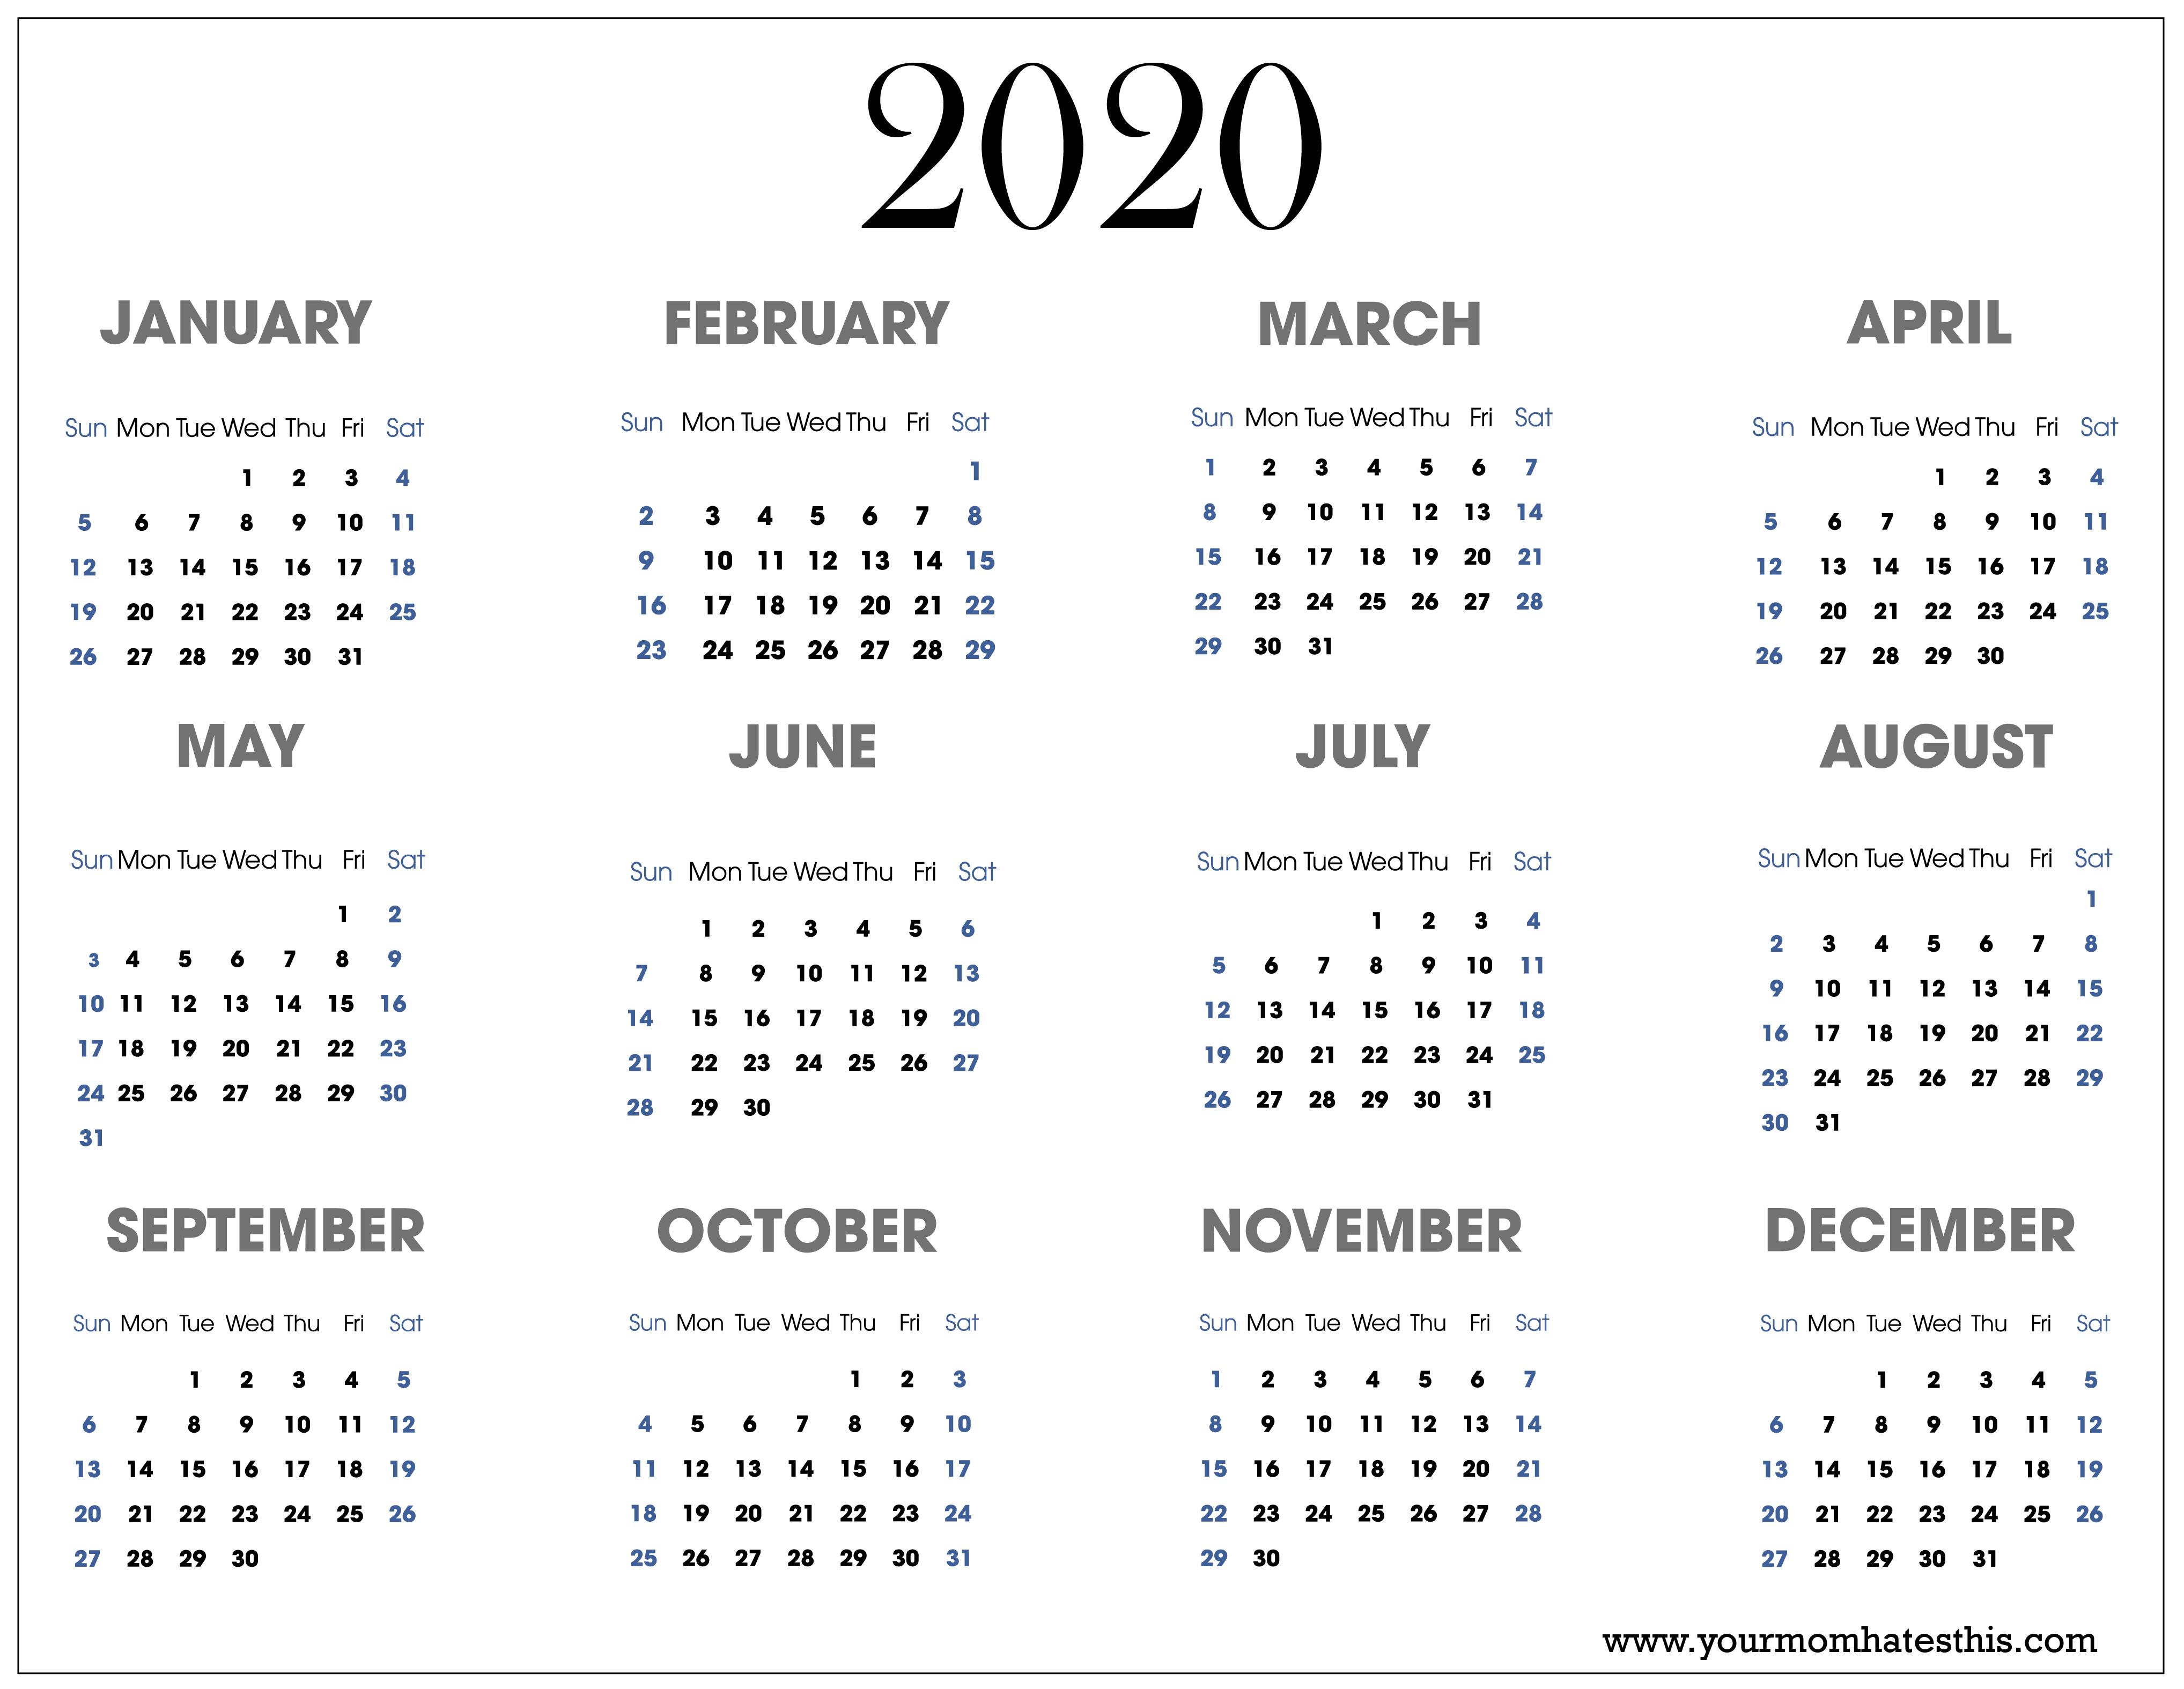 2020 Calendars In Pdf  Download Templates Of Calendar 2020 in Printable 2020 Calander